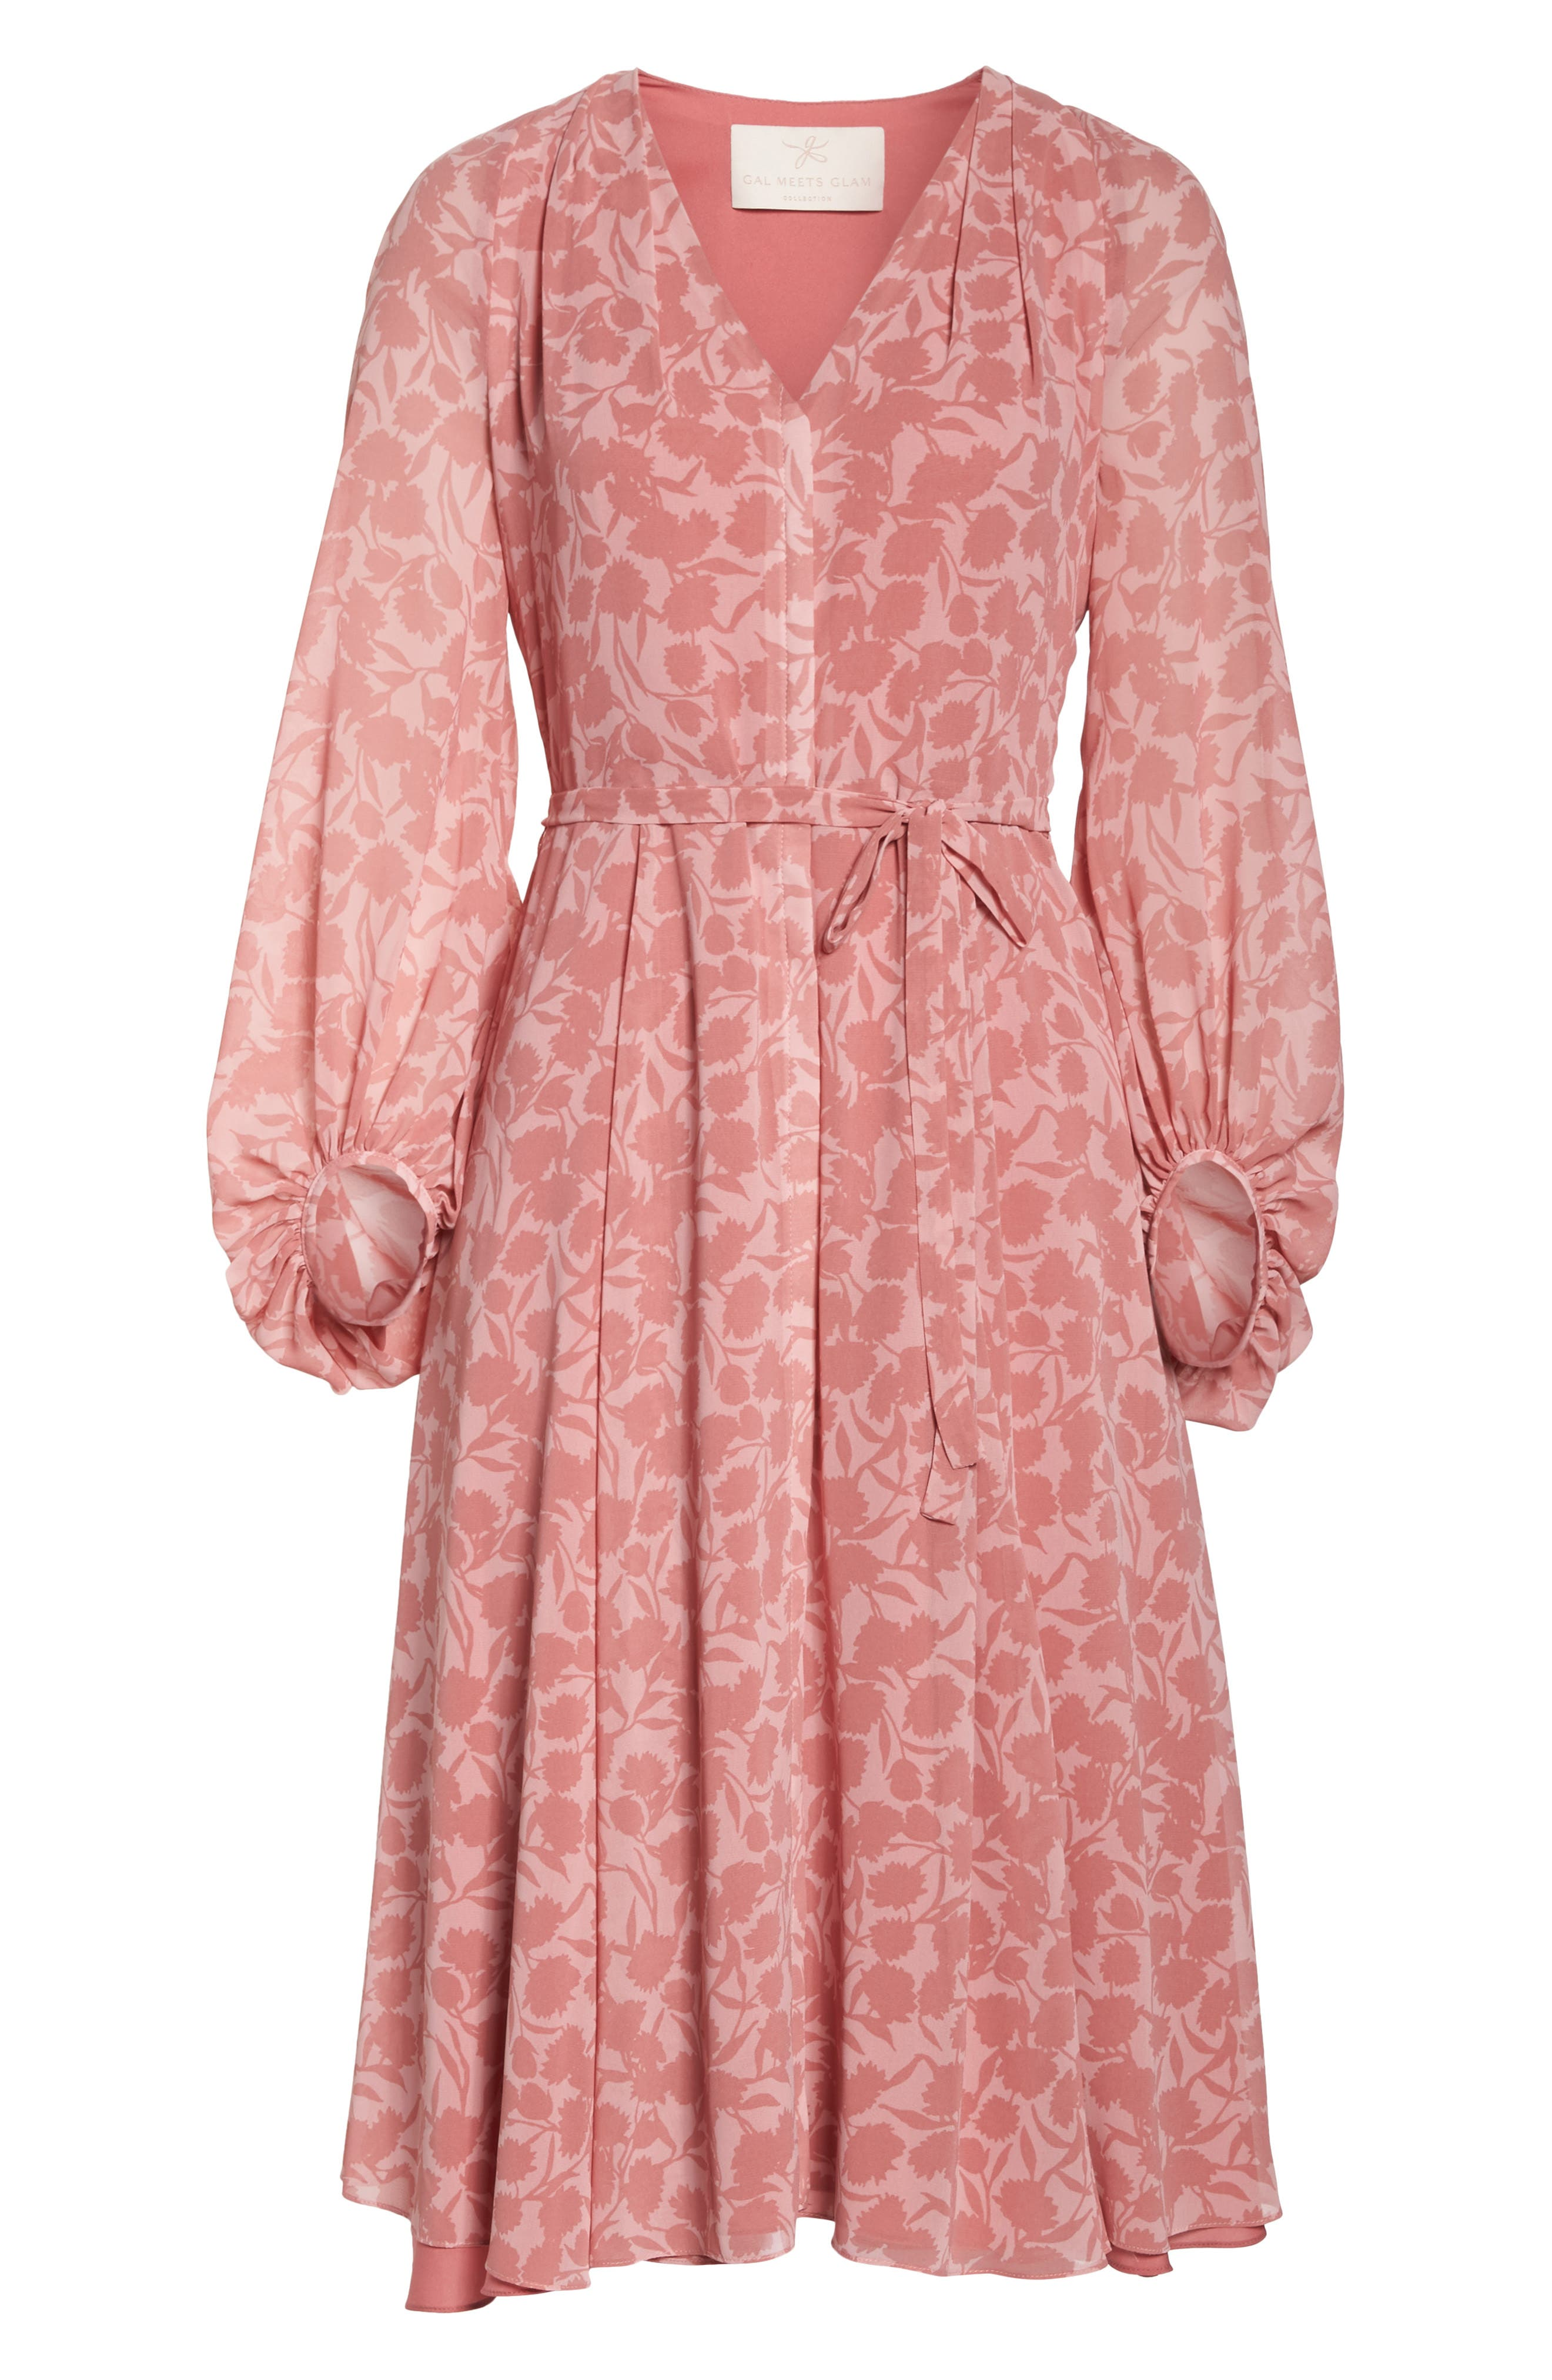 Esther Shadow Branch Chiffon Dress,                             Alternate thumbnail 7, color,                             690